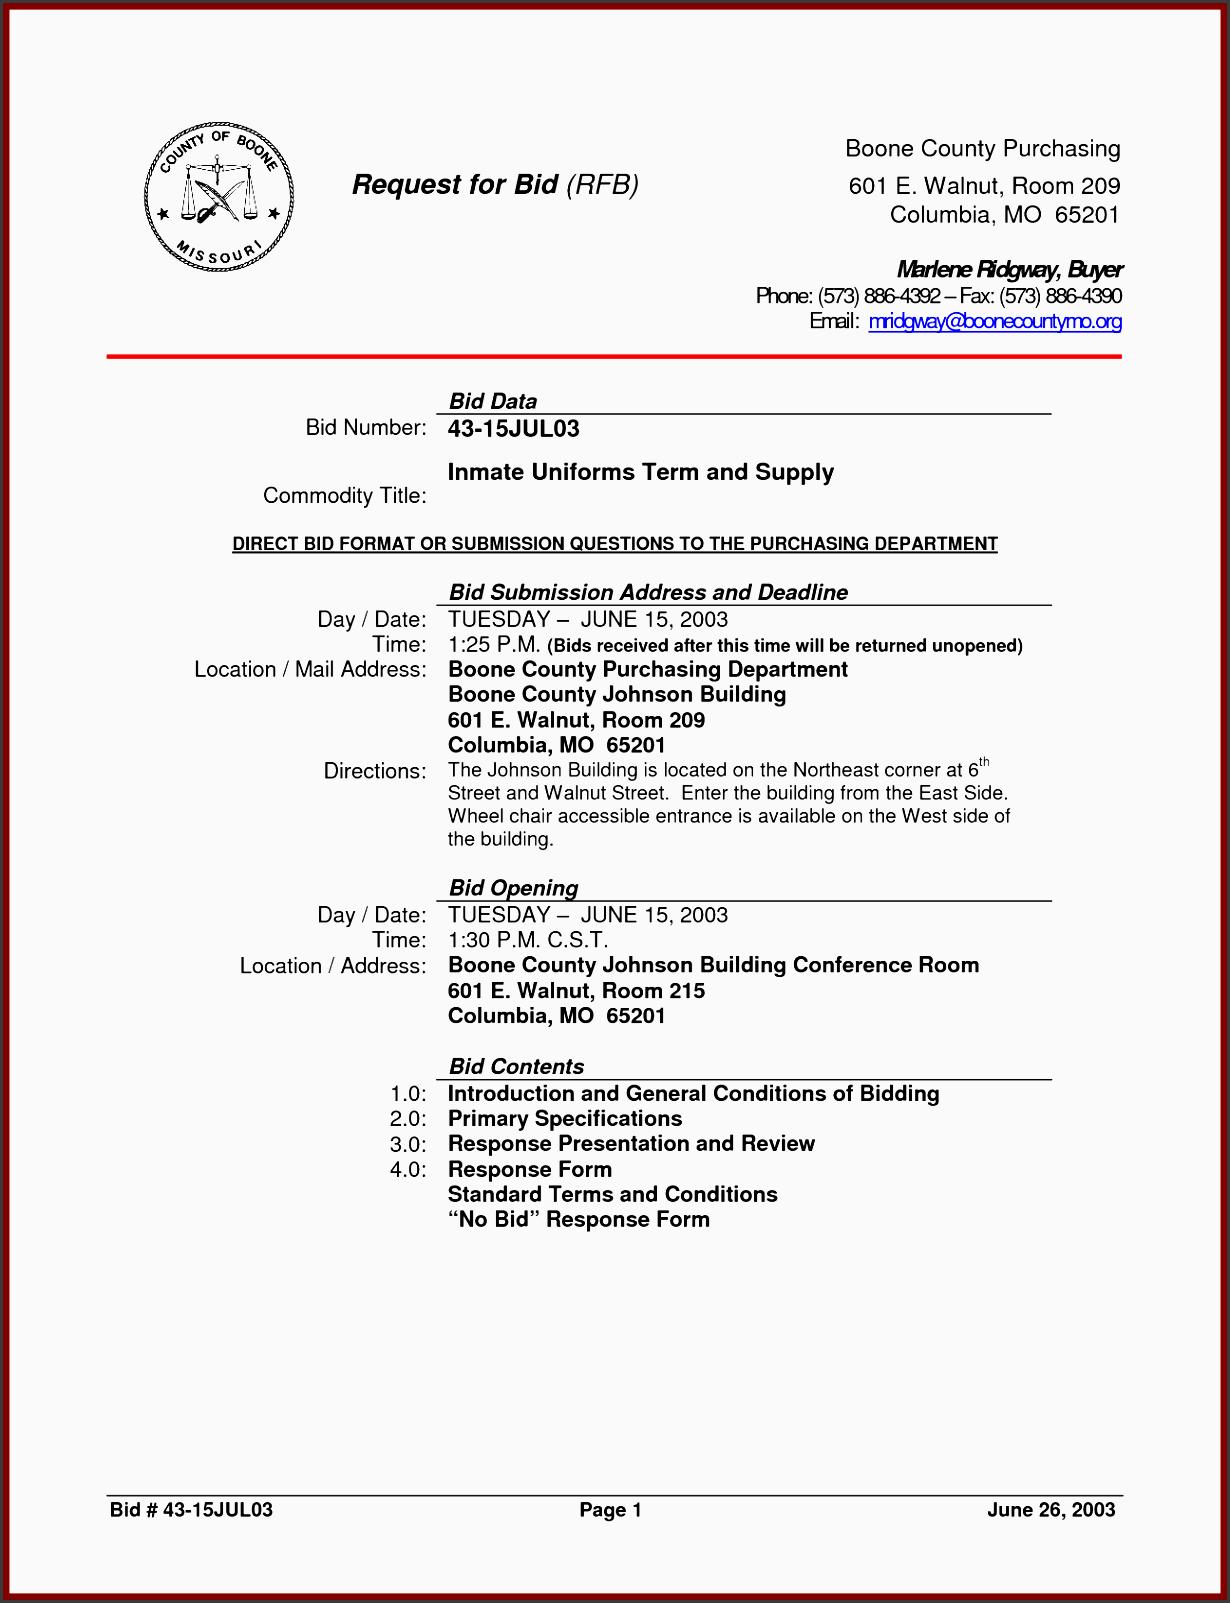 Free proposal letter template best of proposal letter template doc free proposal letter template 47 how to make business proposal sample letter sampletemplatess 47 spiritdancerdesigns Images